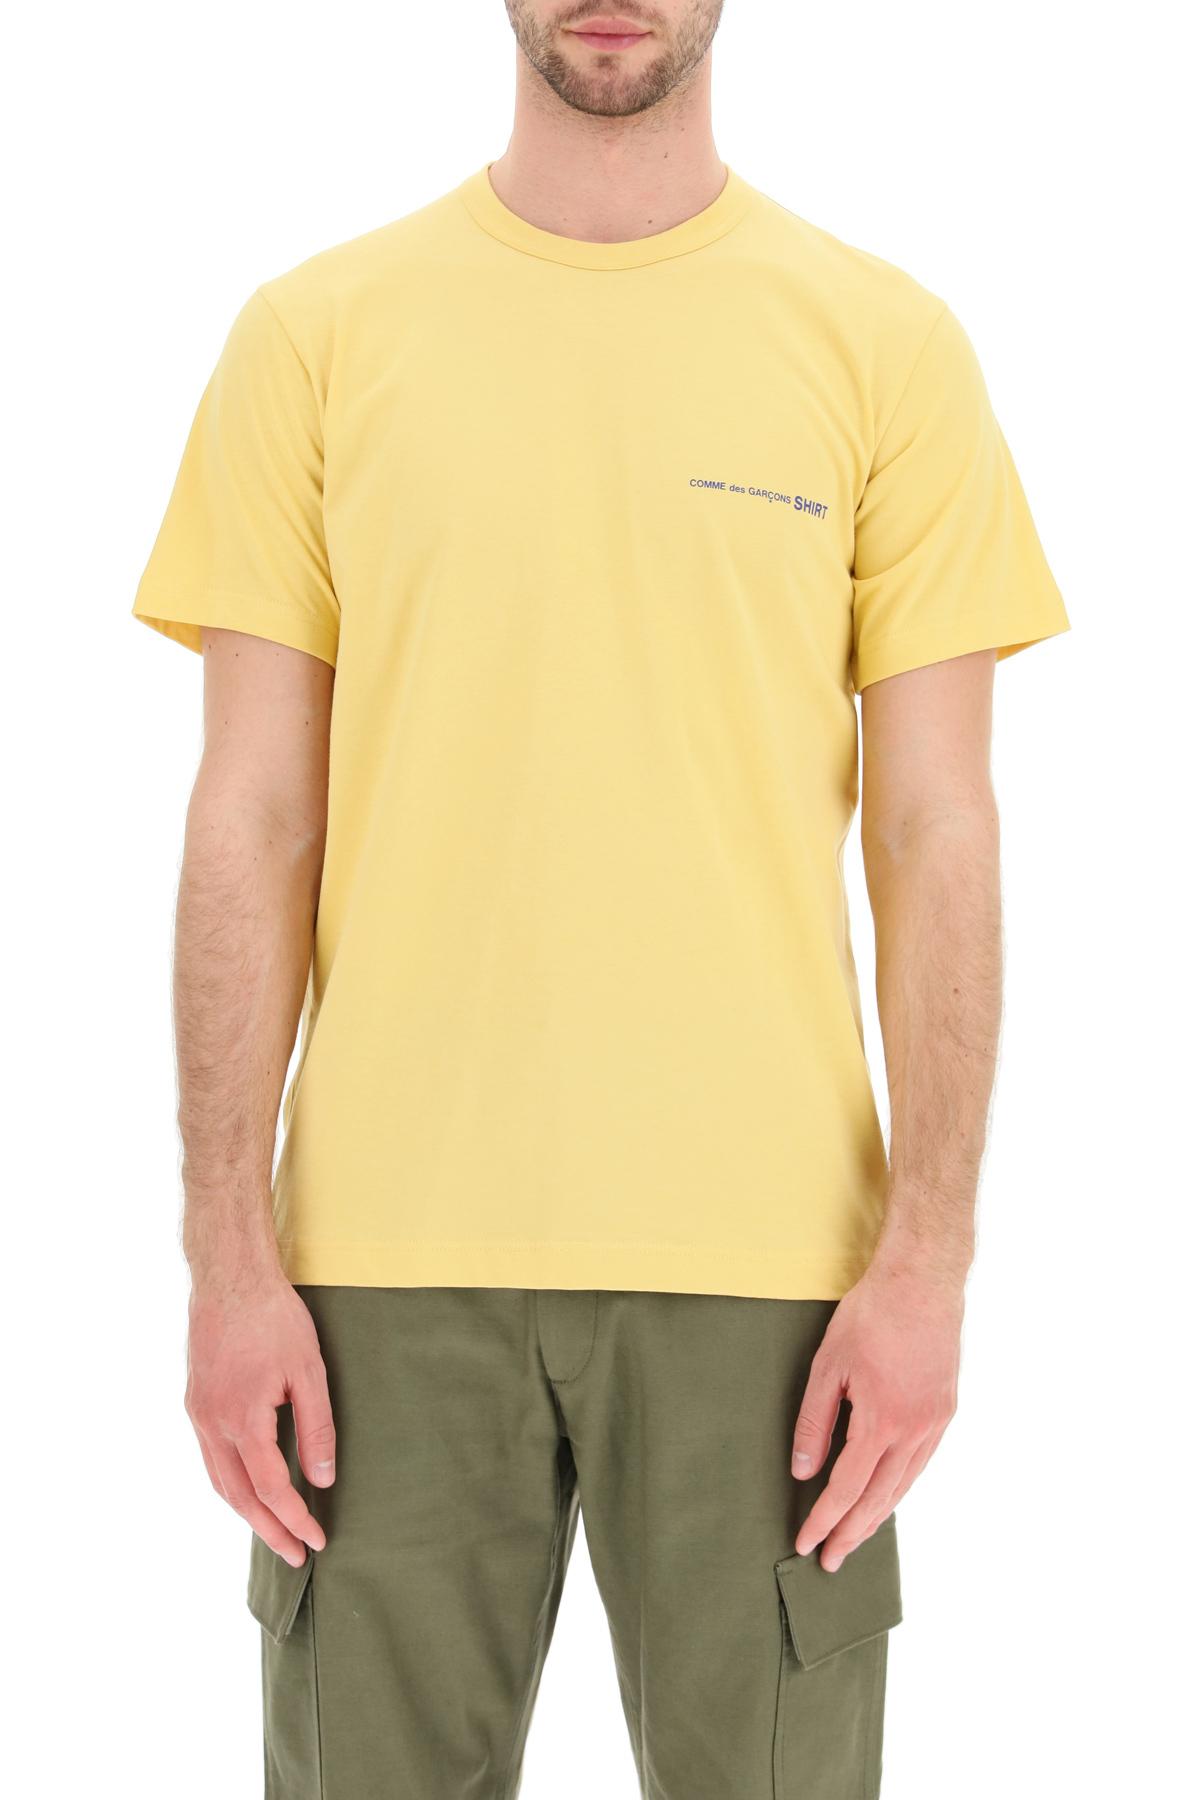 Comme des garcons shirt t- shirt basic con stampa logo